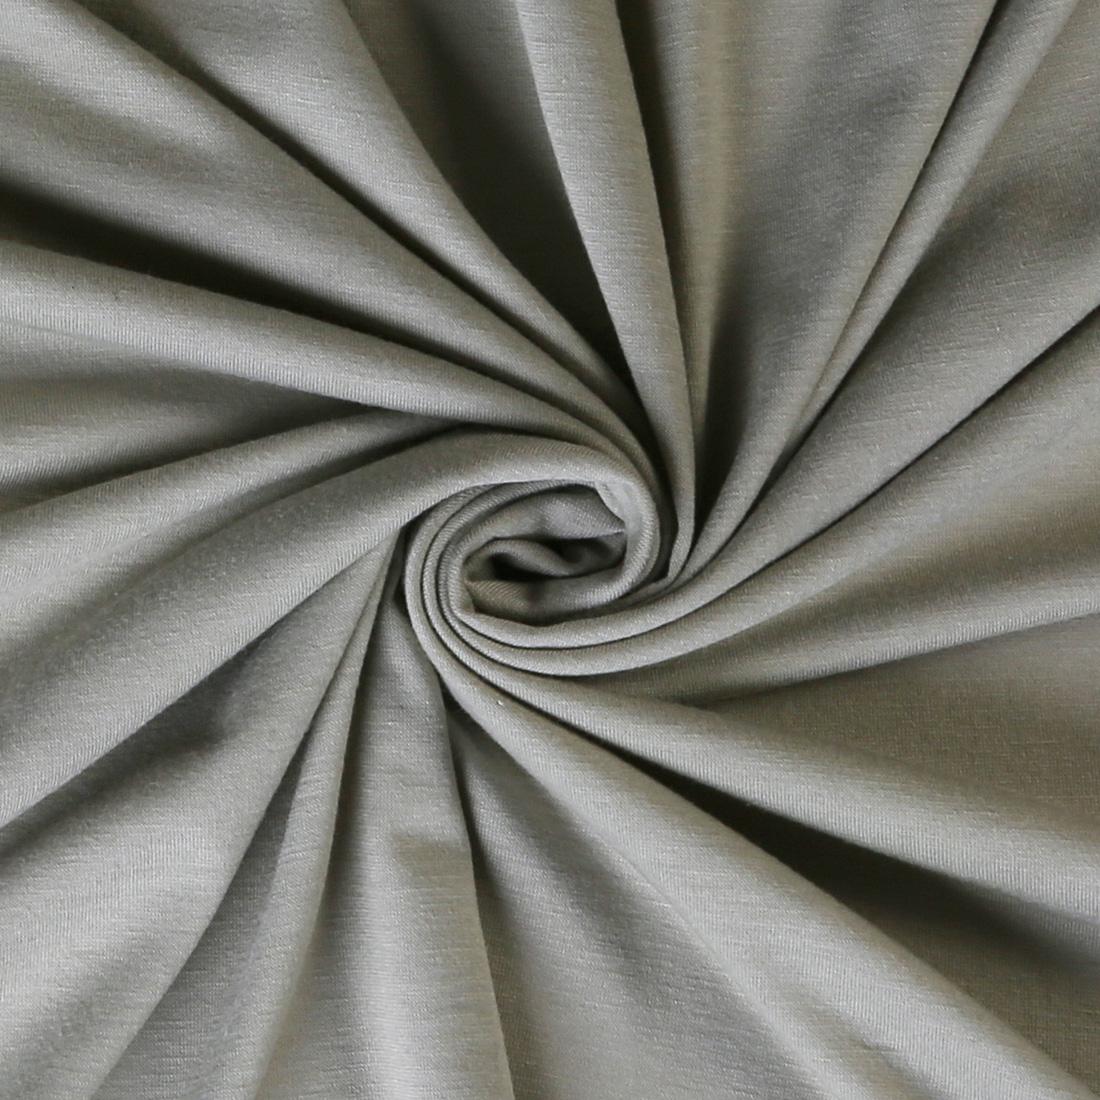 Viscose Spandex Jersey Linen